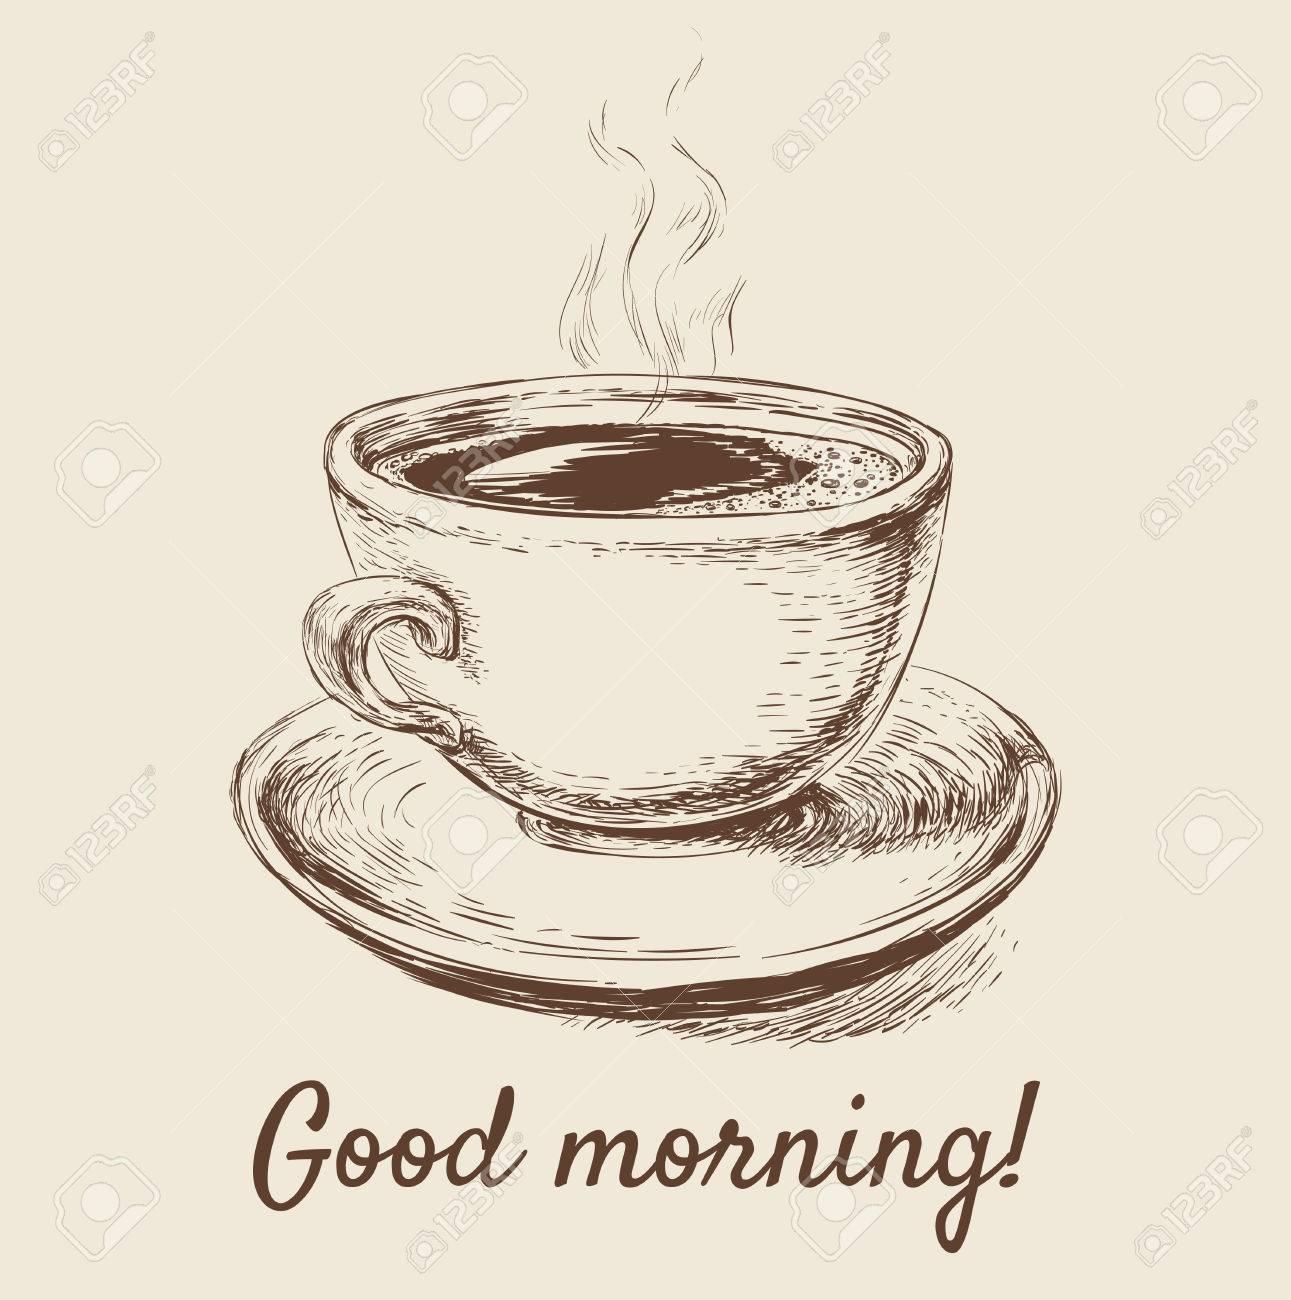 Hand Drawn Sketch Coffee Cup Vector Illustration Hand Drawn Sketch Coffee Cup Vector Illustration - 68608567